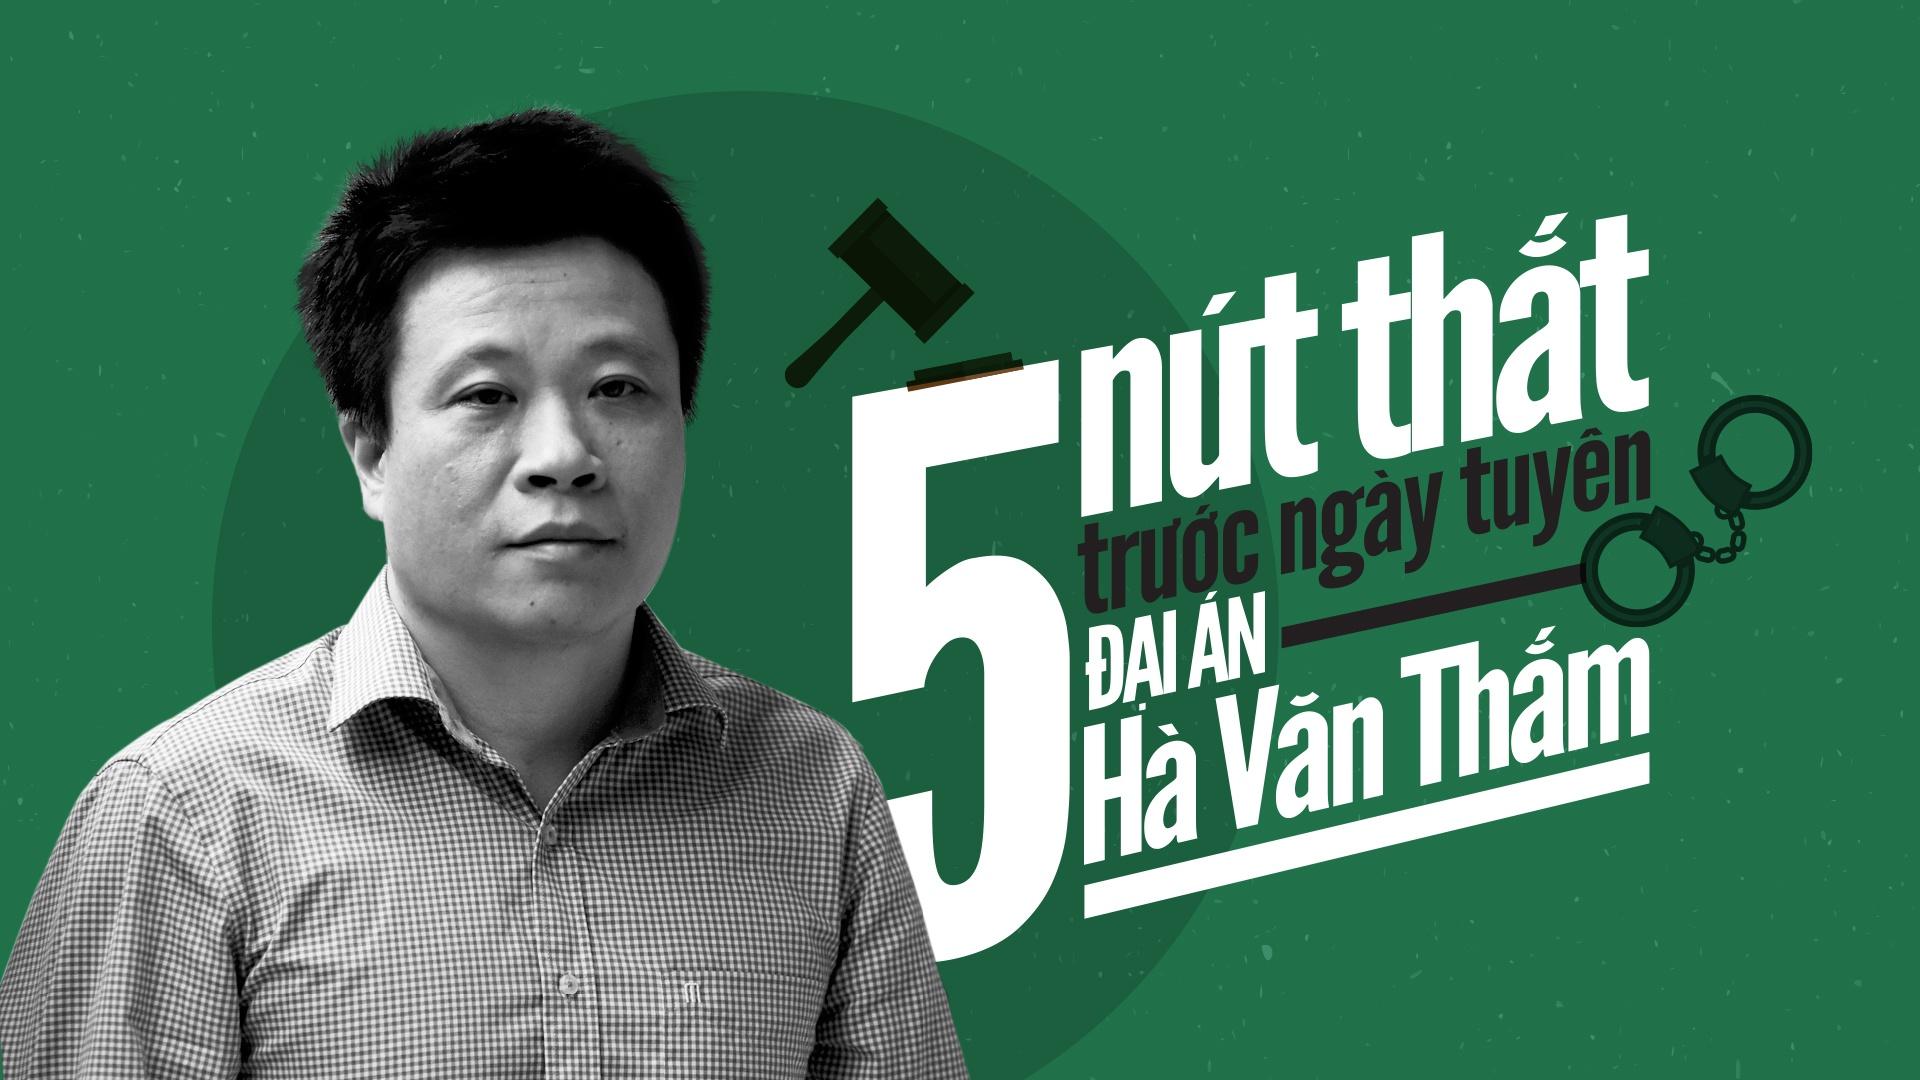 Dai an Ha Van Tham anh 2